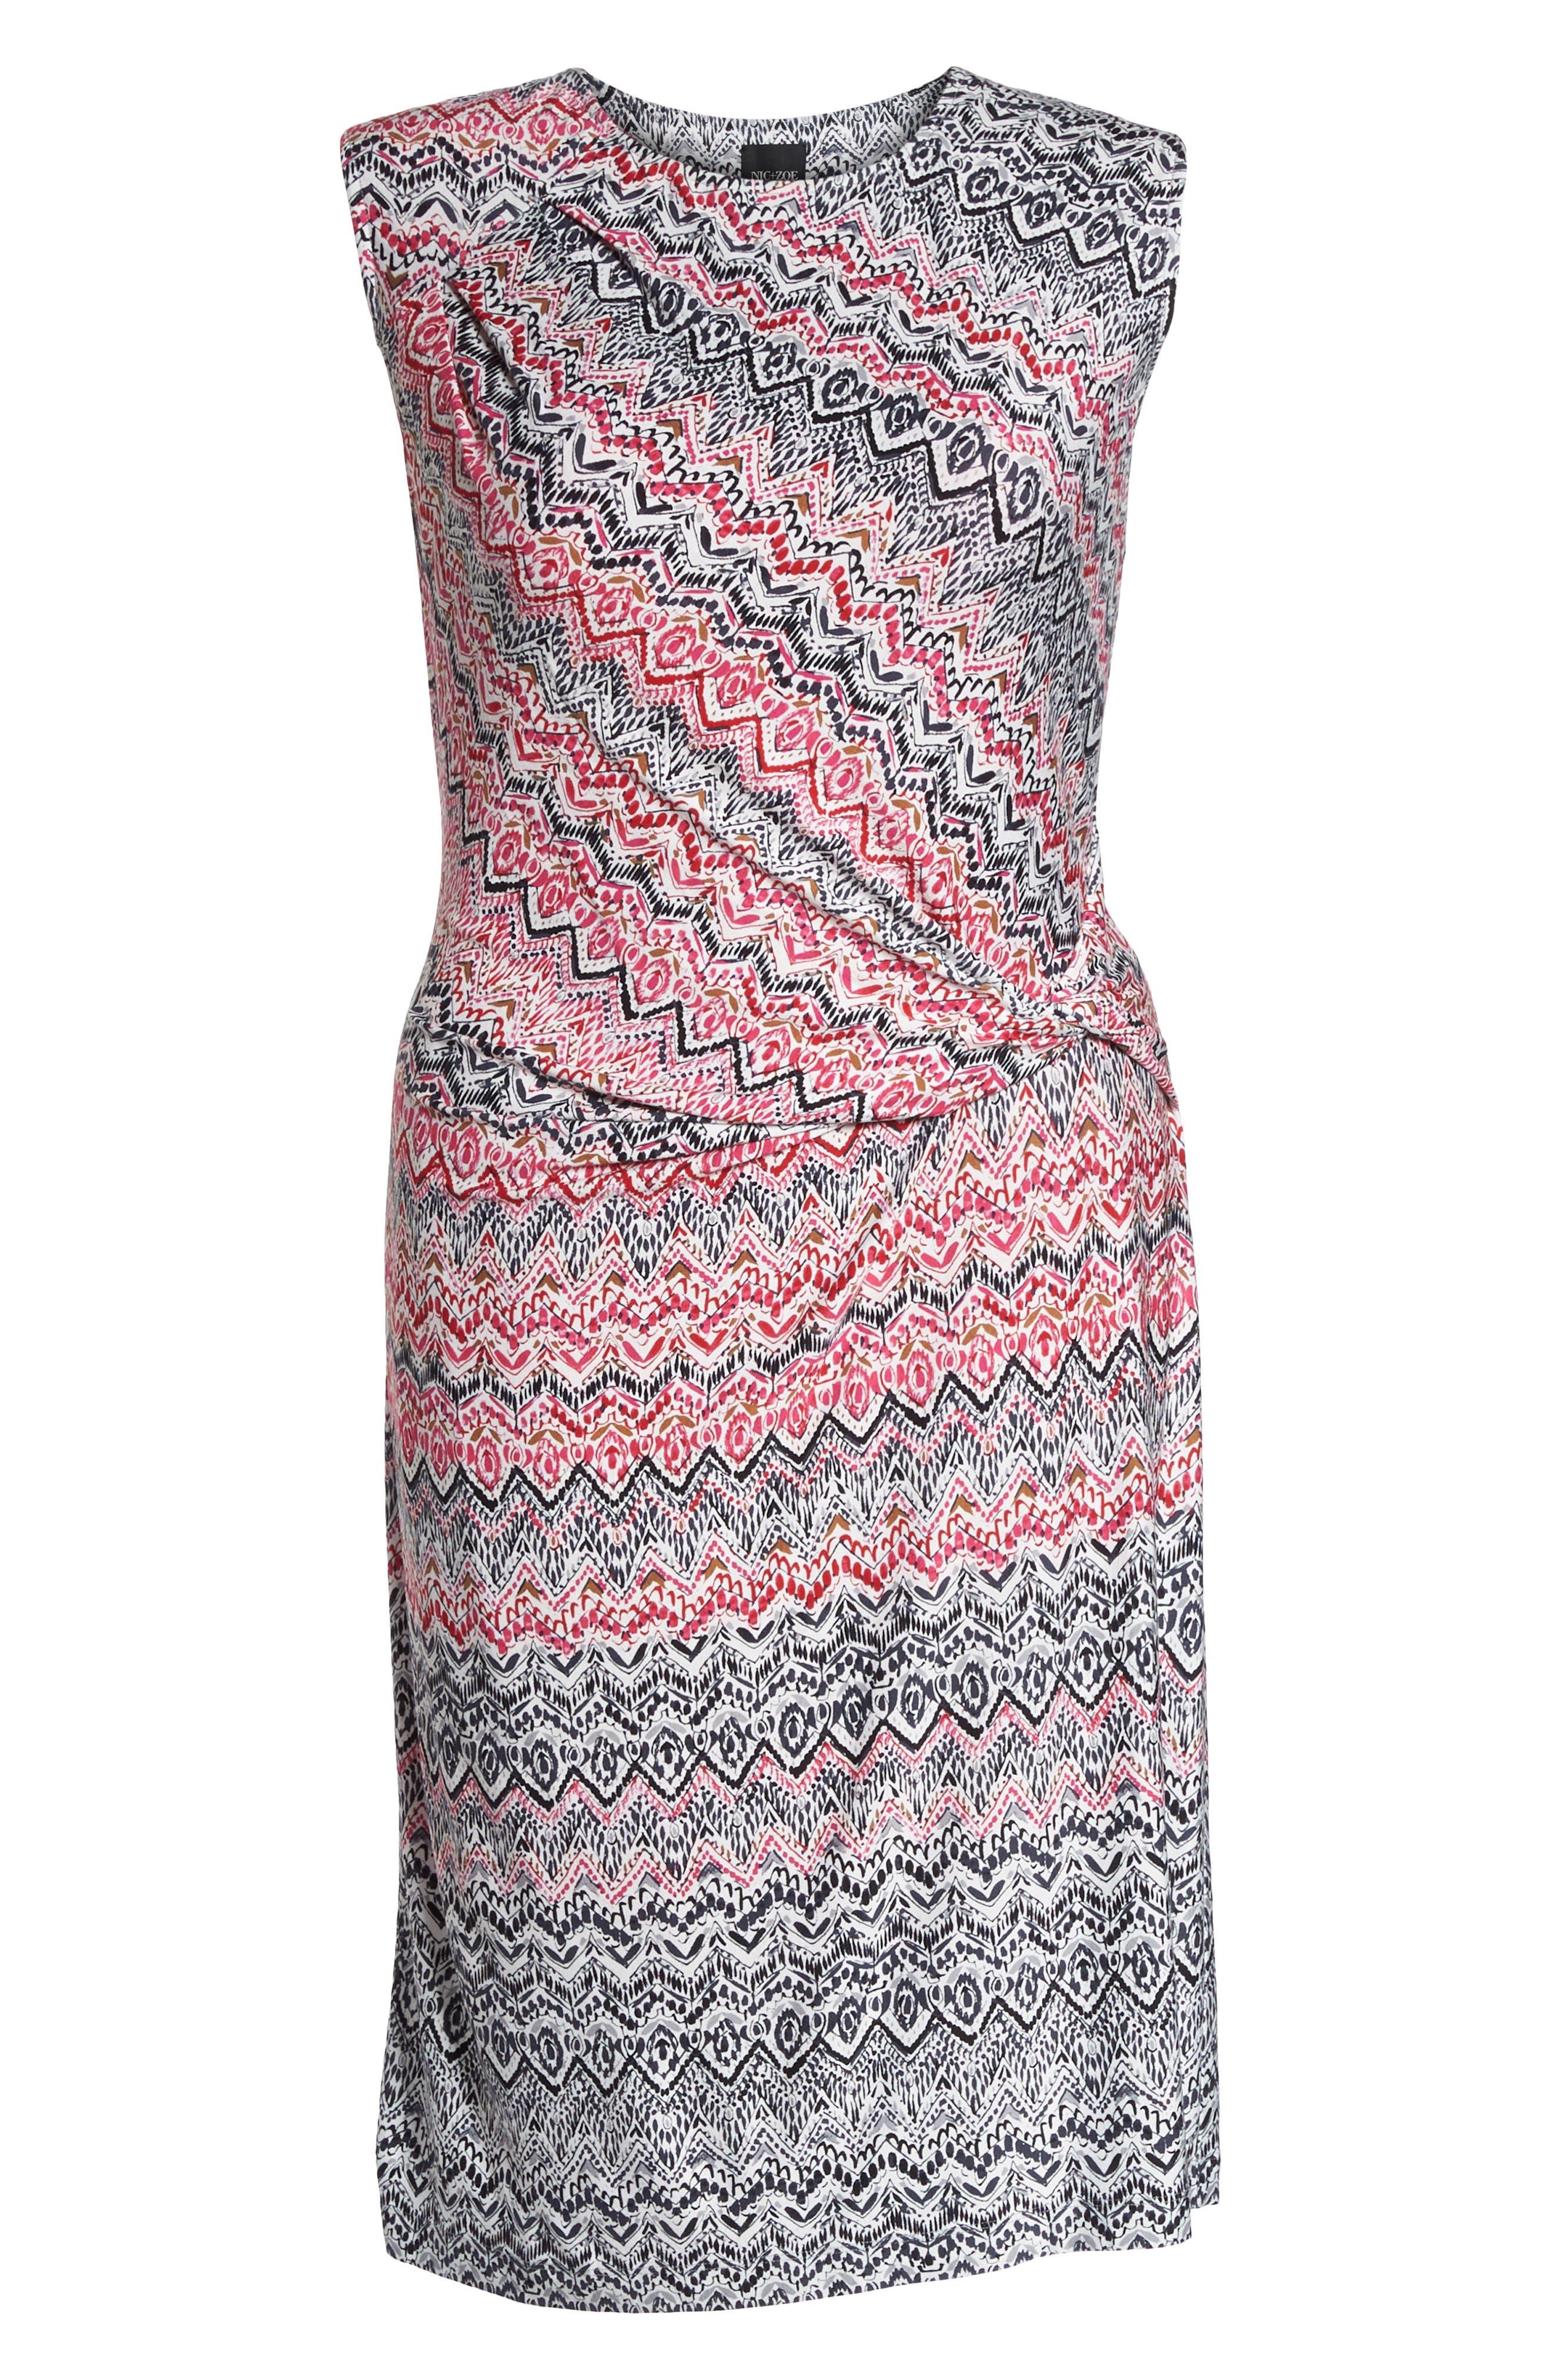 Spiced Up Twist Sheath Dress,                             Alternate thumbnail 6, color,                             Multi